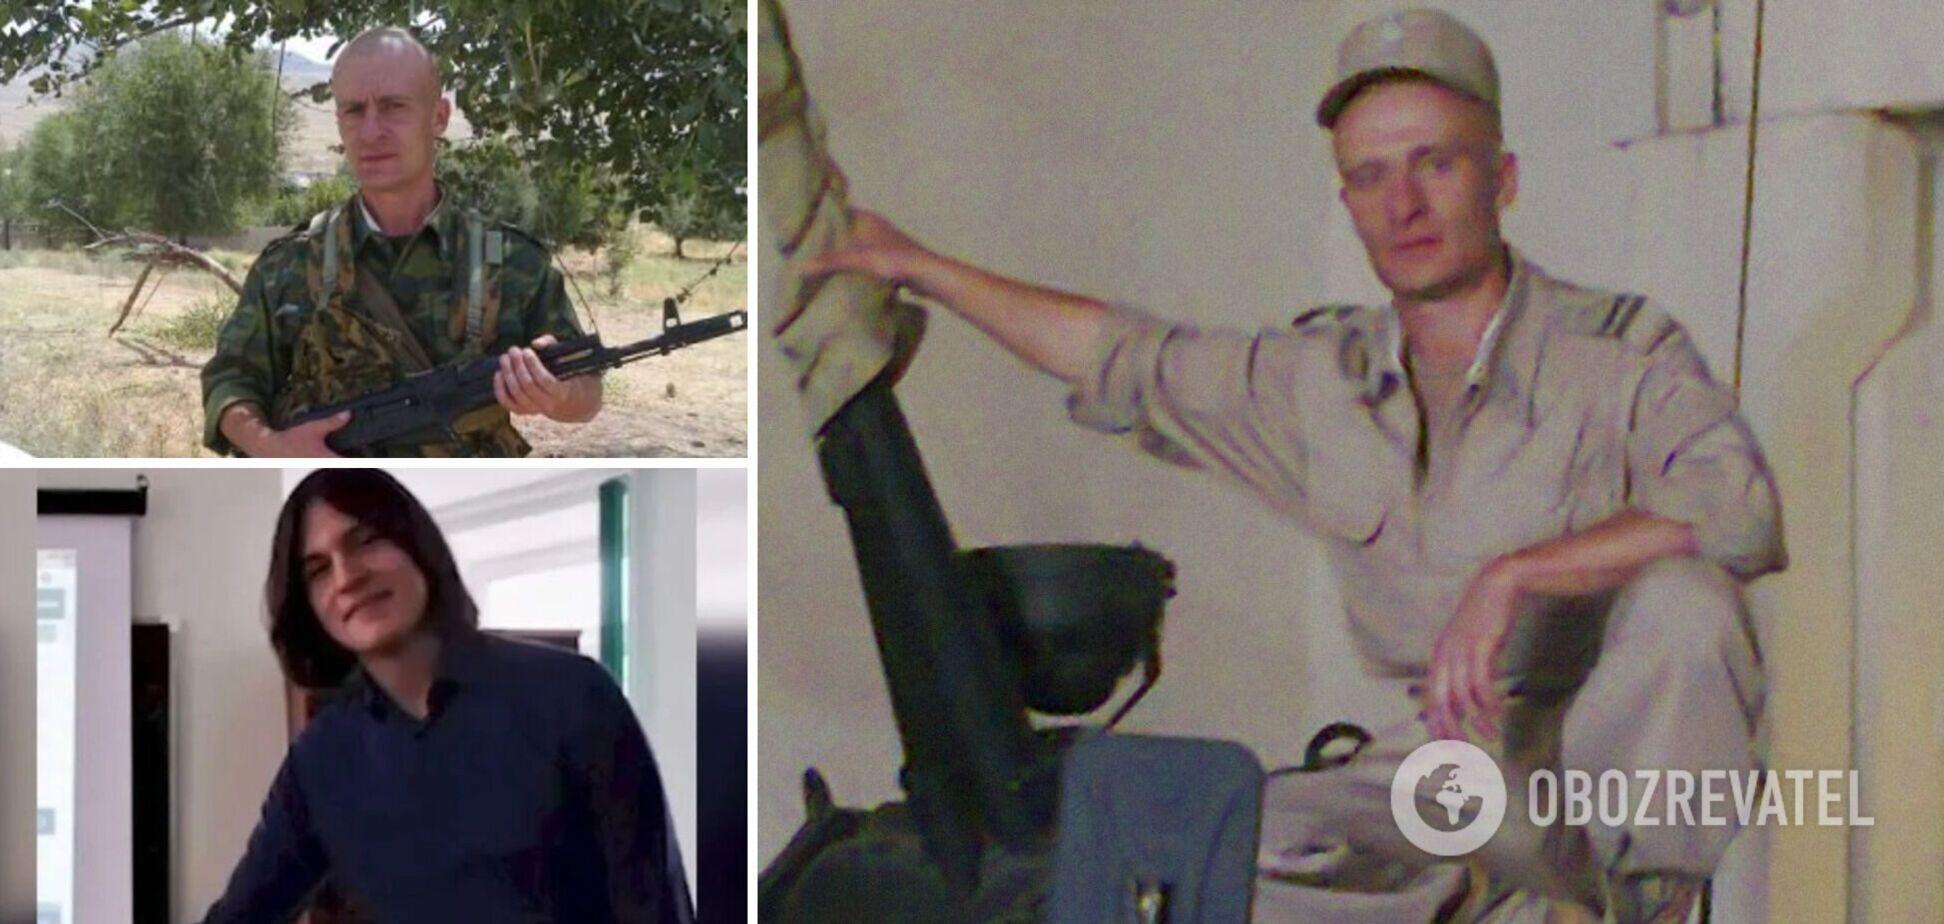 Отец Тимура Бекмансурова воевал в Сирии и на Донбассе